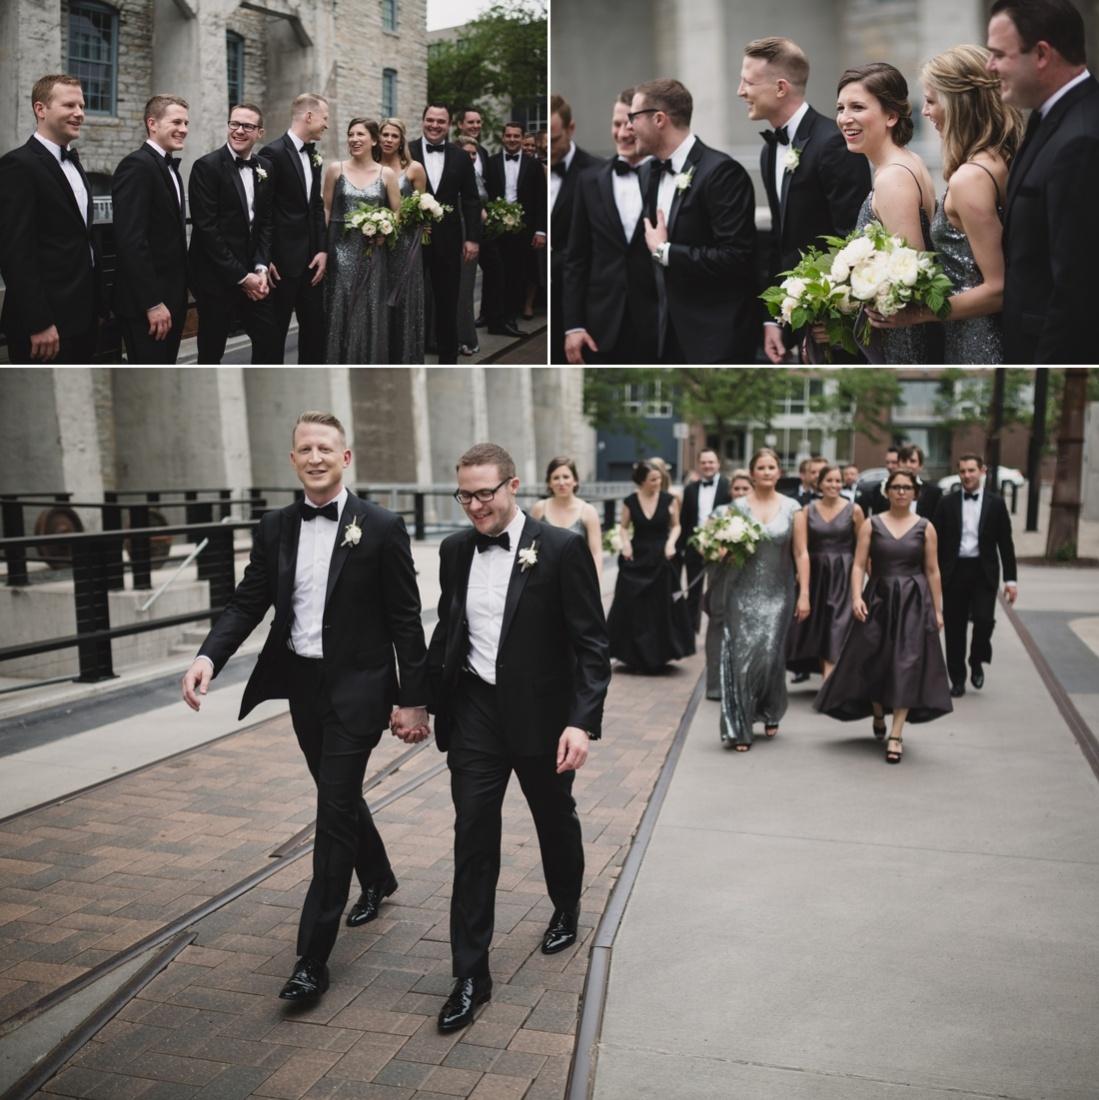 04_Minneapolis_Machine_Shop_Wedding-1099x1100-1.jpg